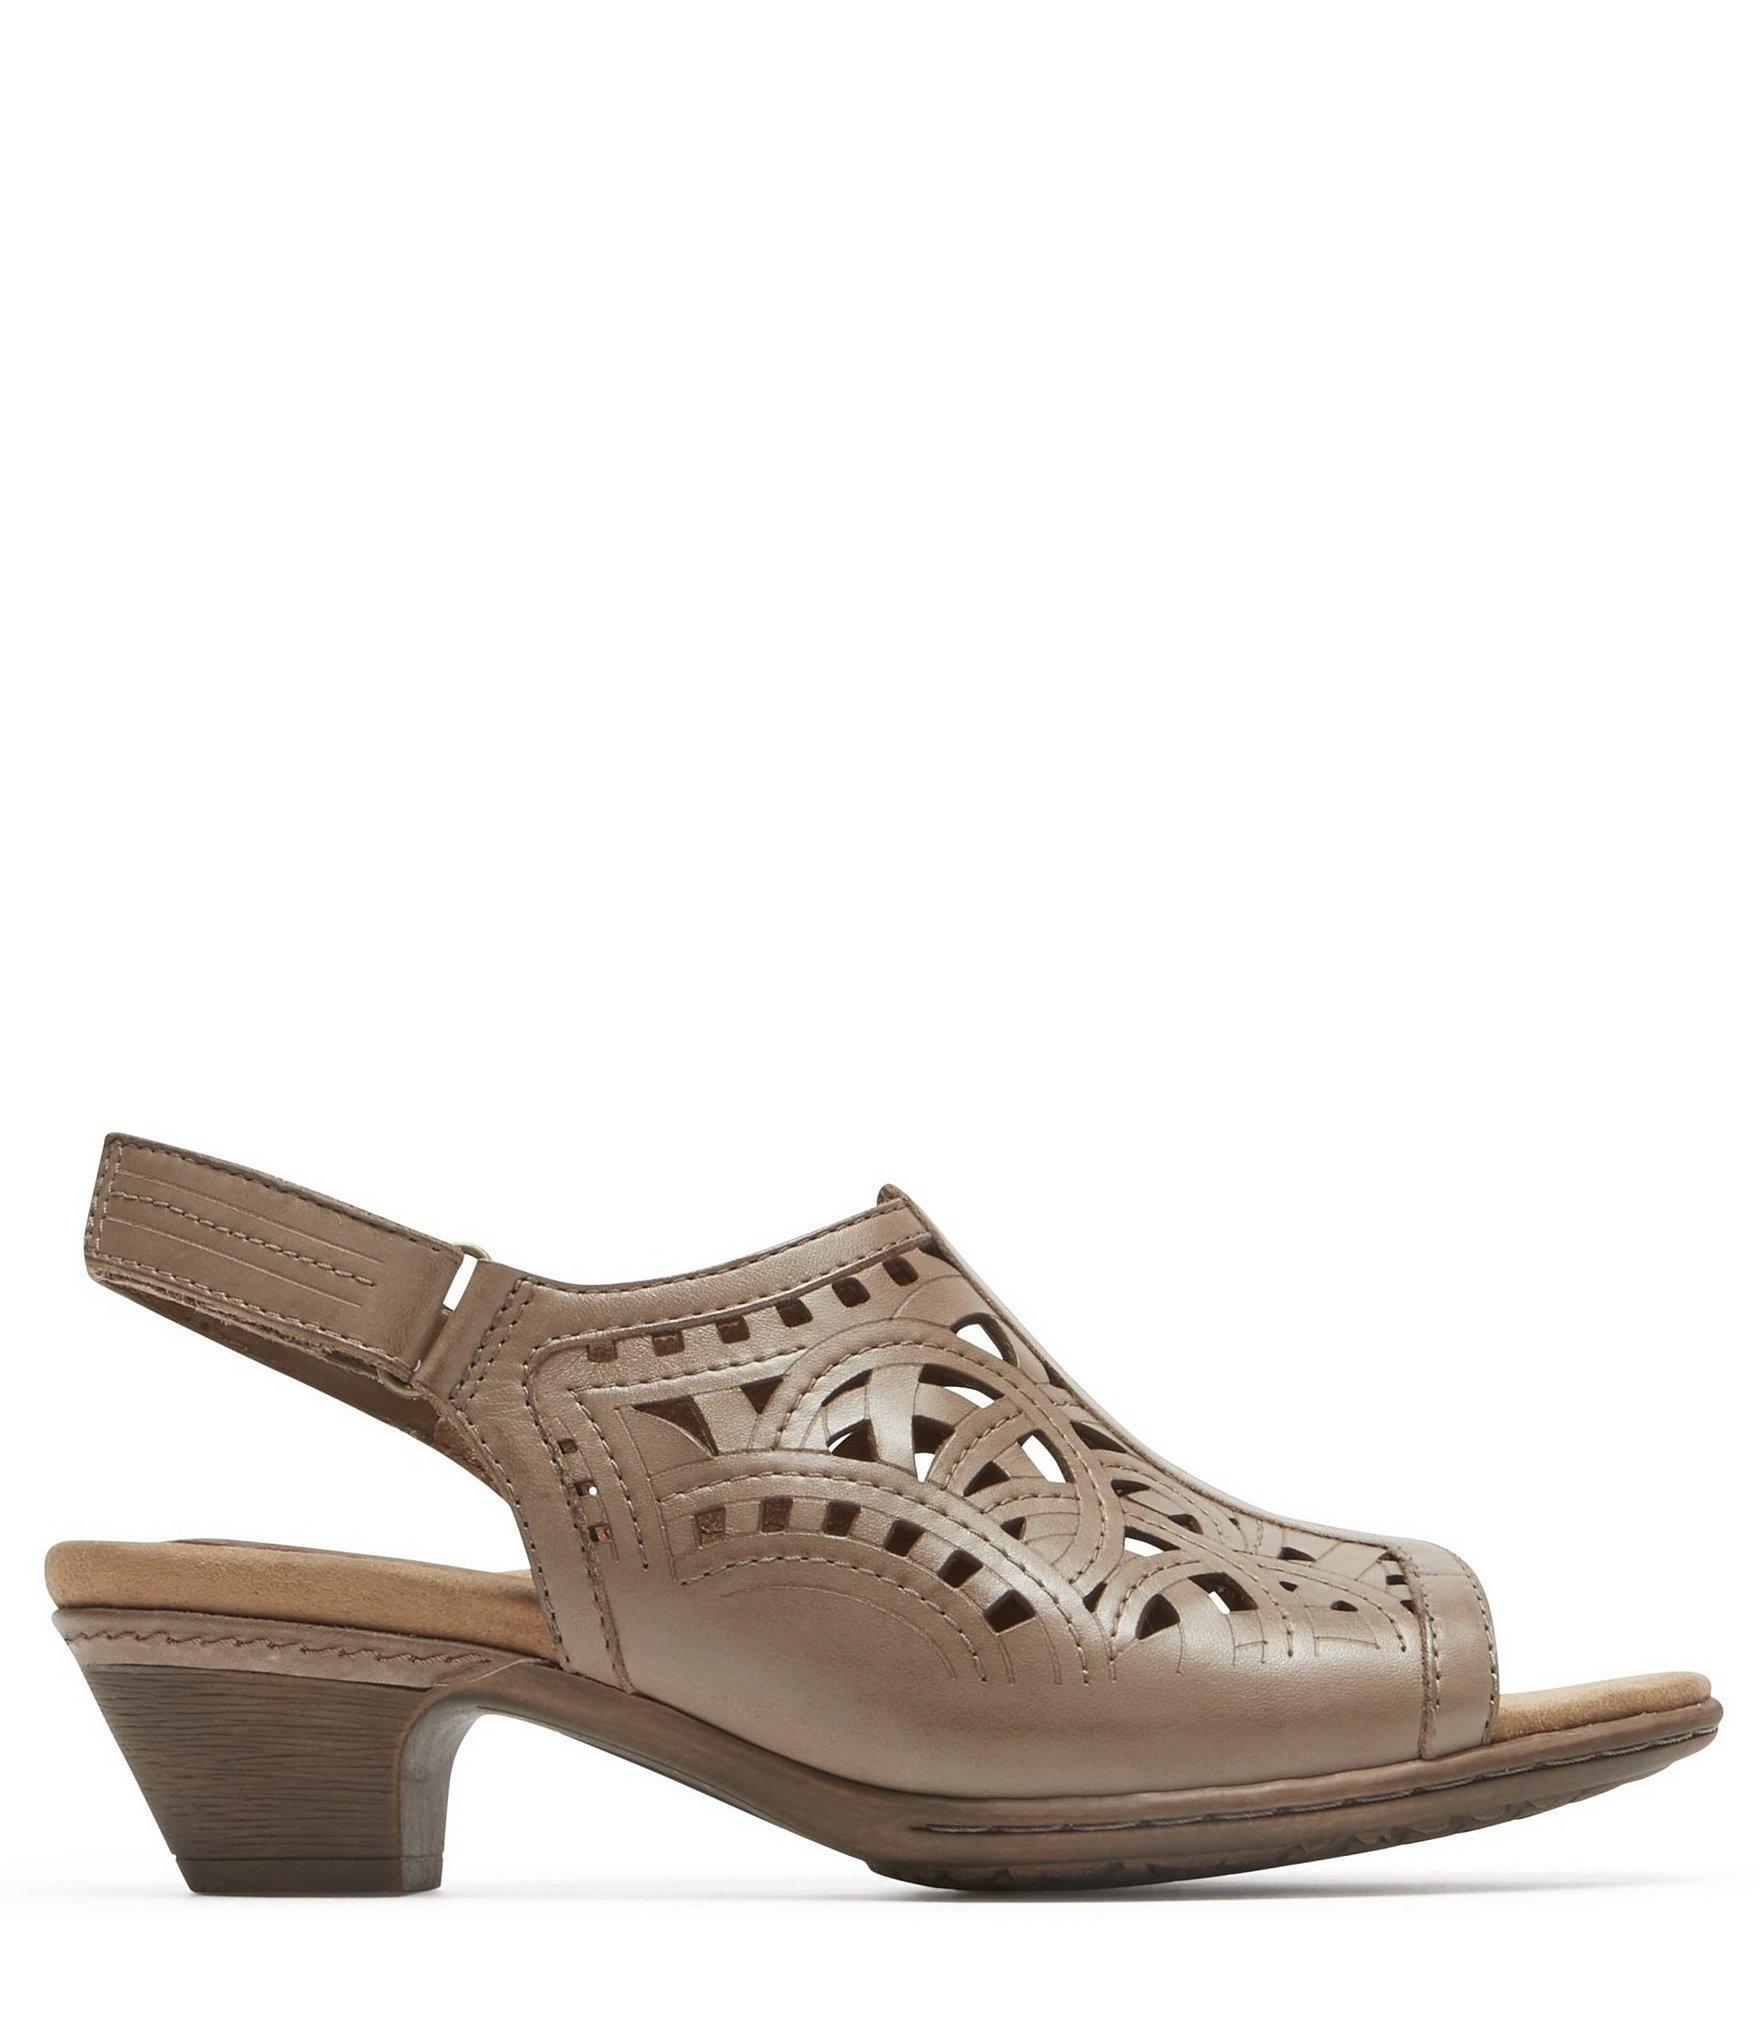 102ad2f8a Lyst - Rockport Cobb Hill Abbott High Vamp Sling Sandals in Brown